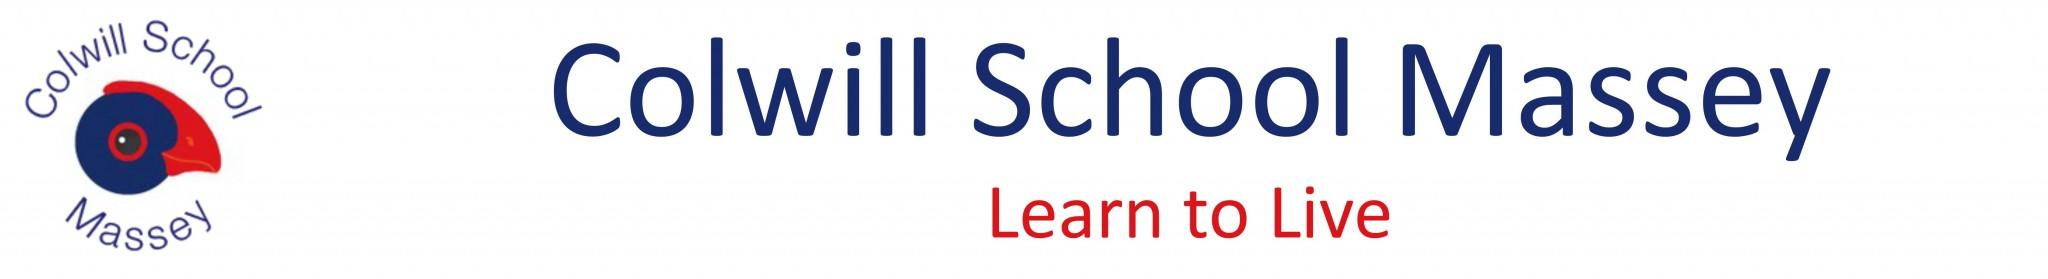 Colwill School Massey Logo